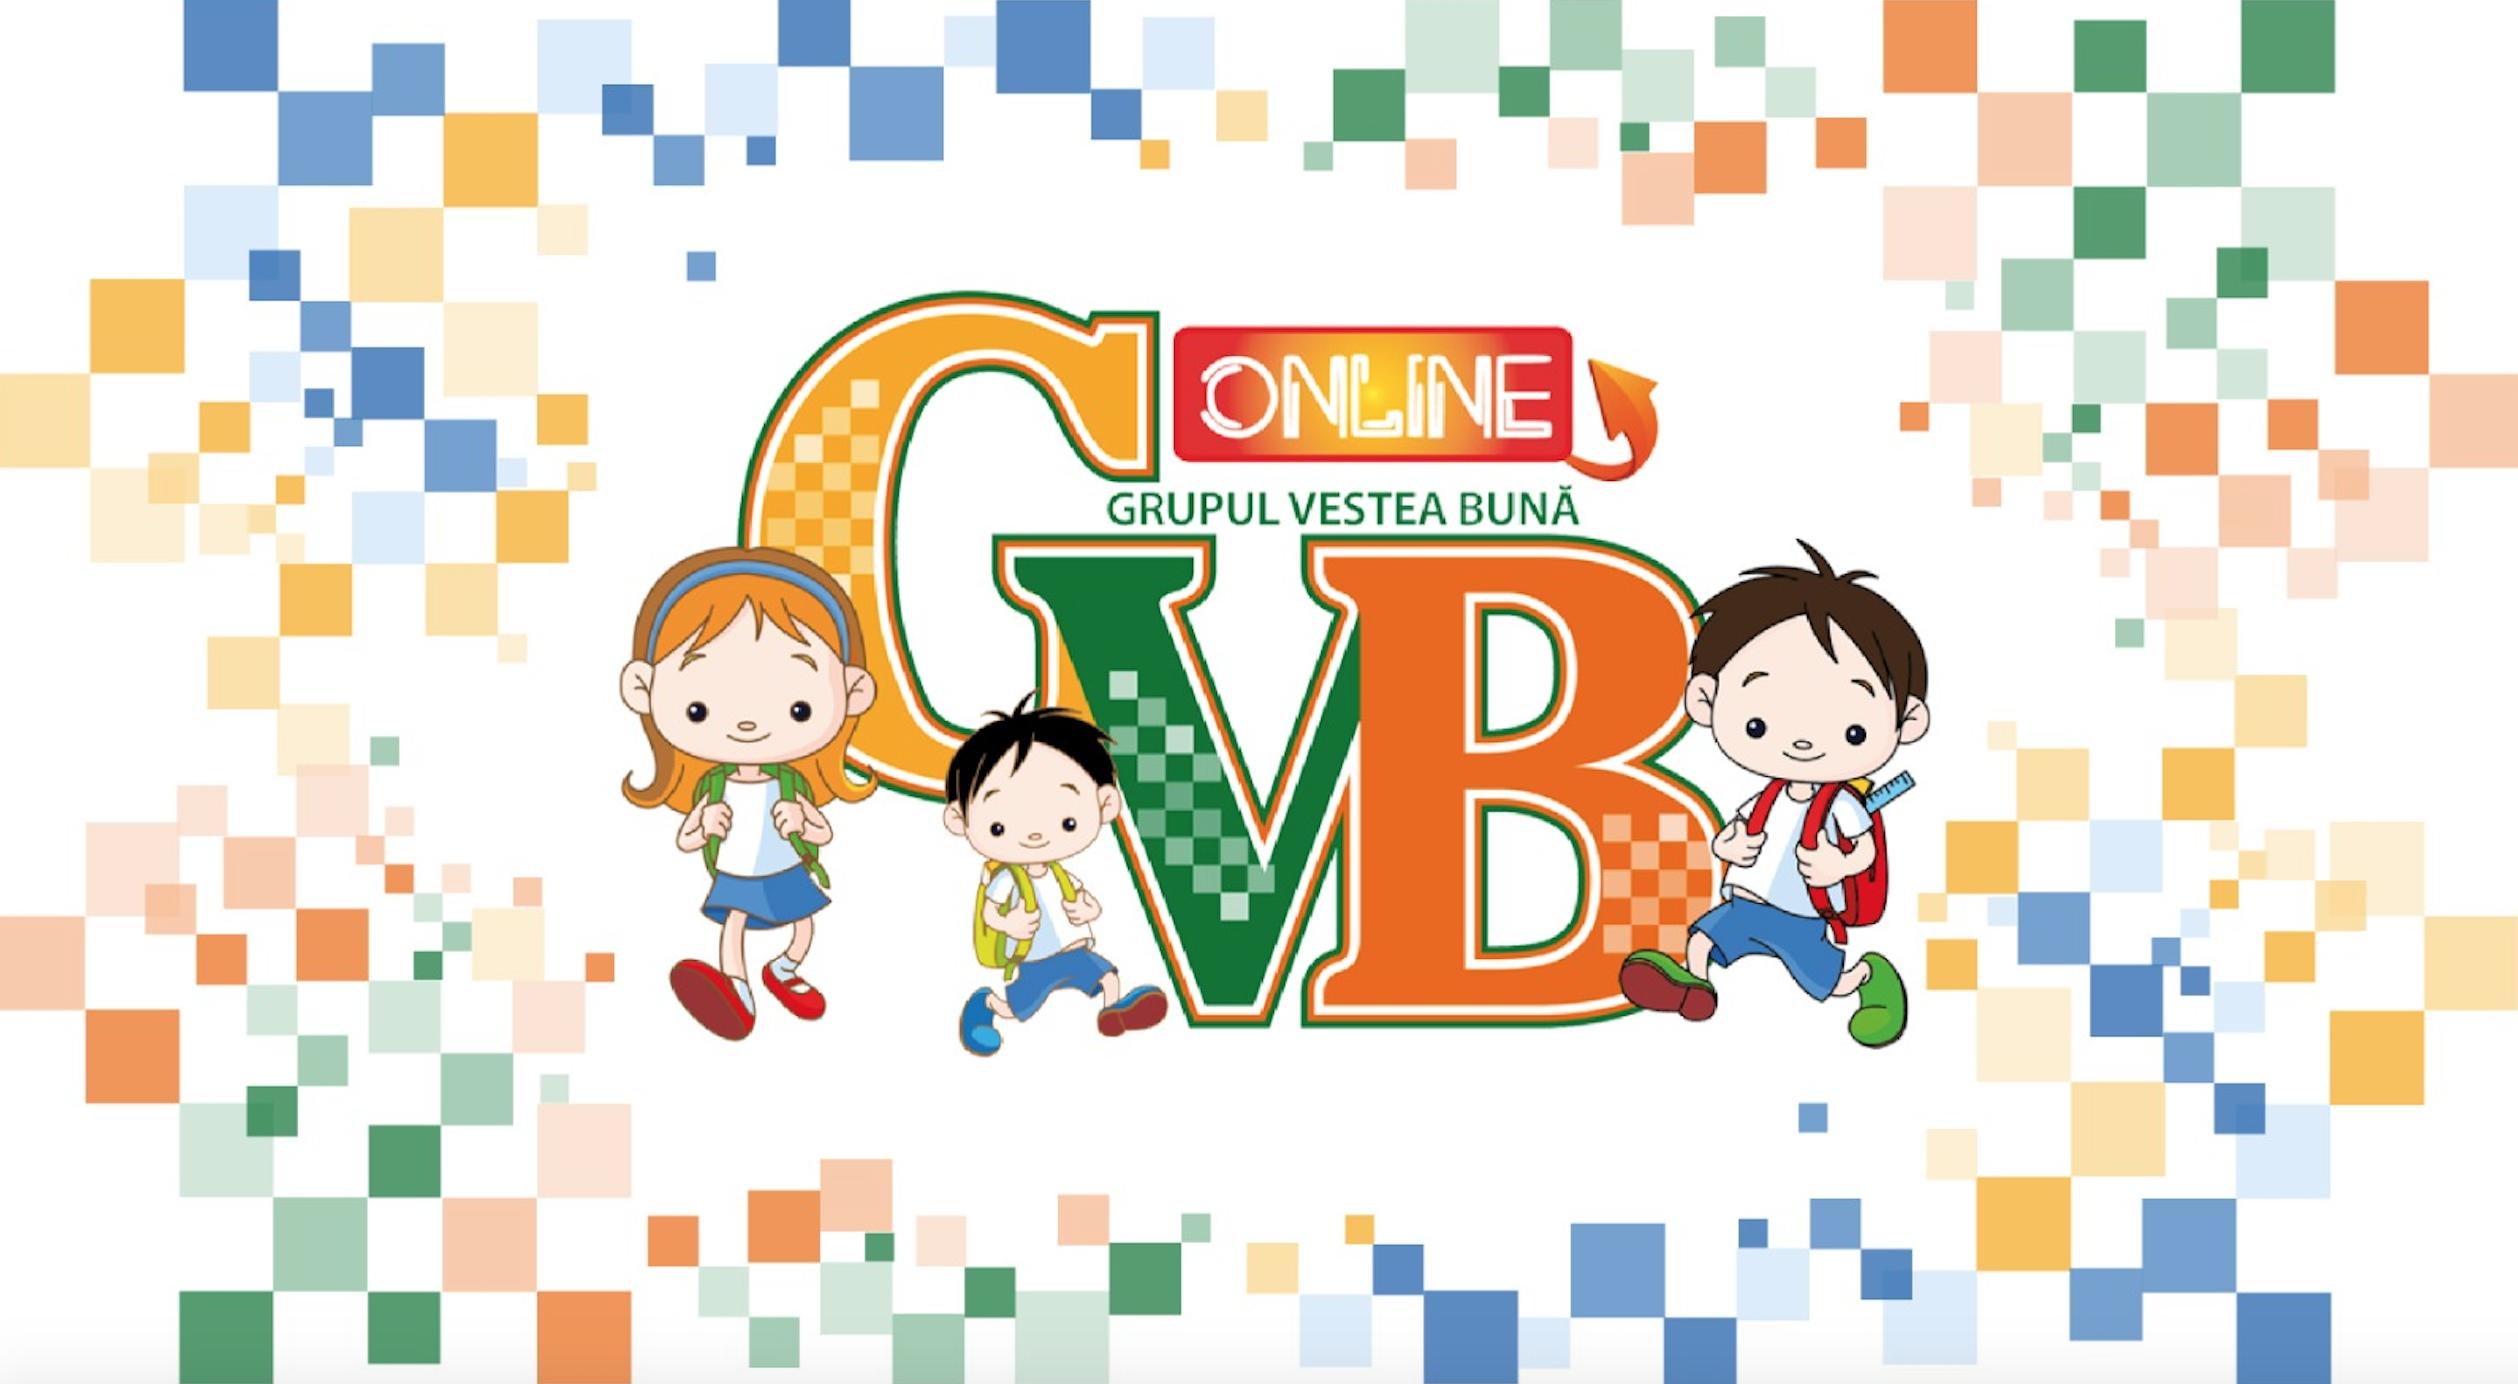 GVB online